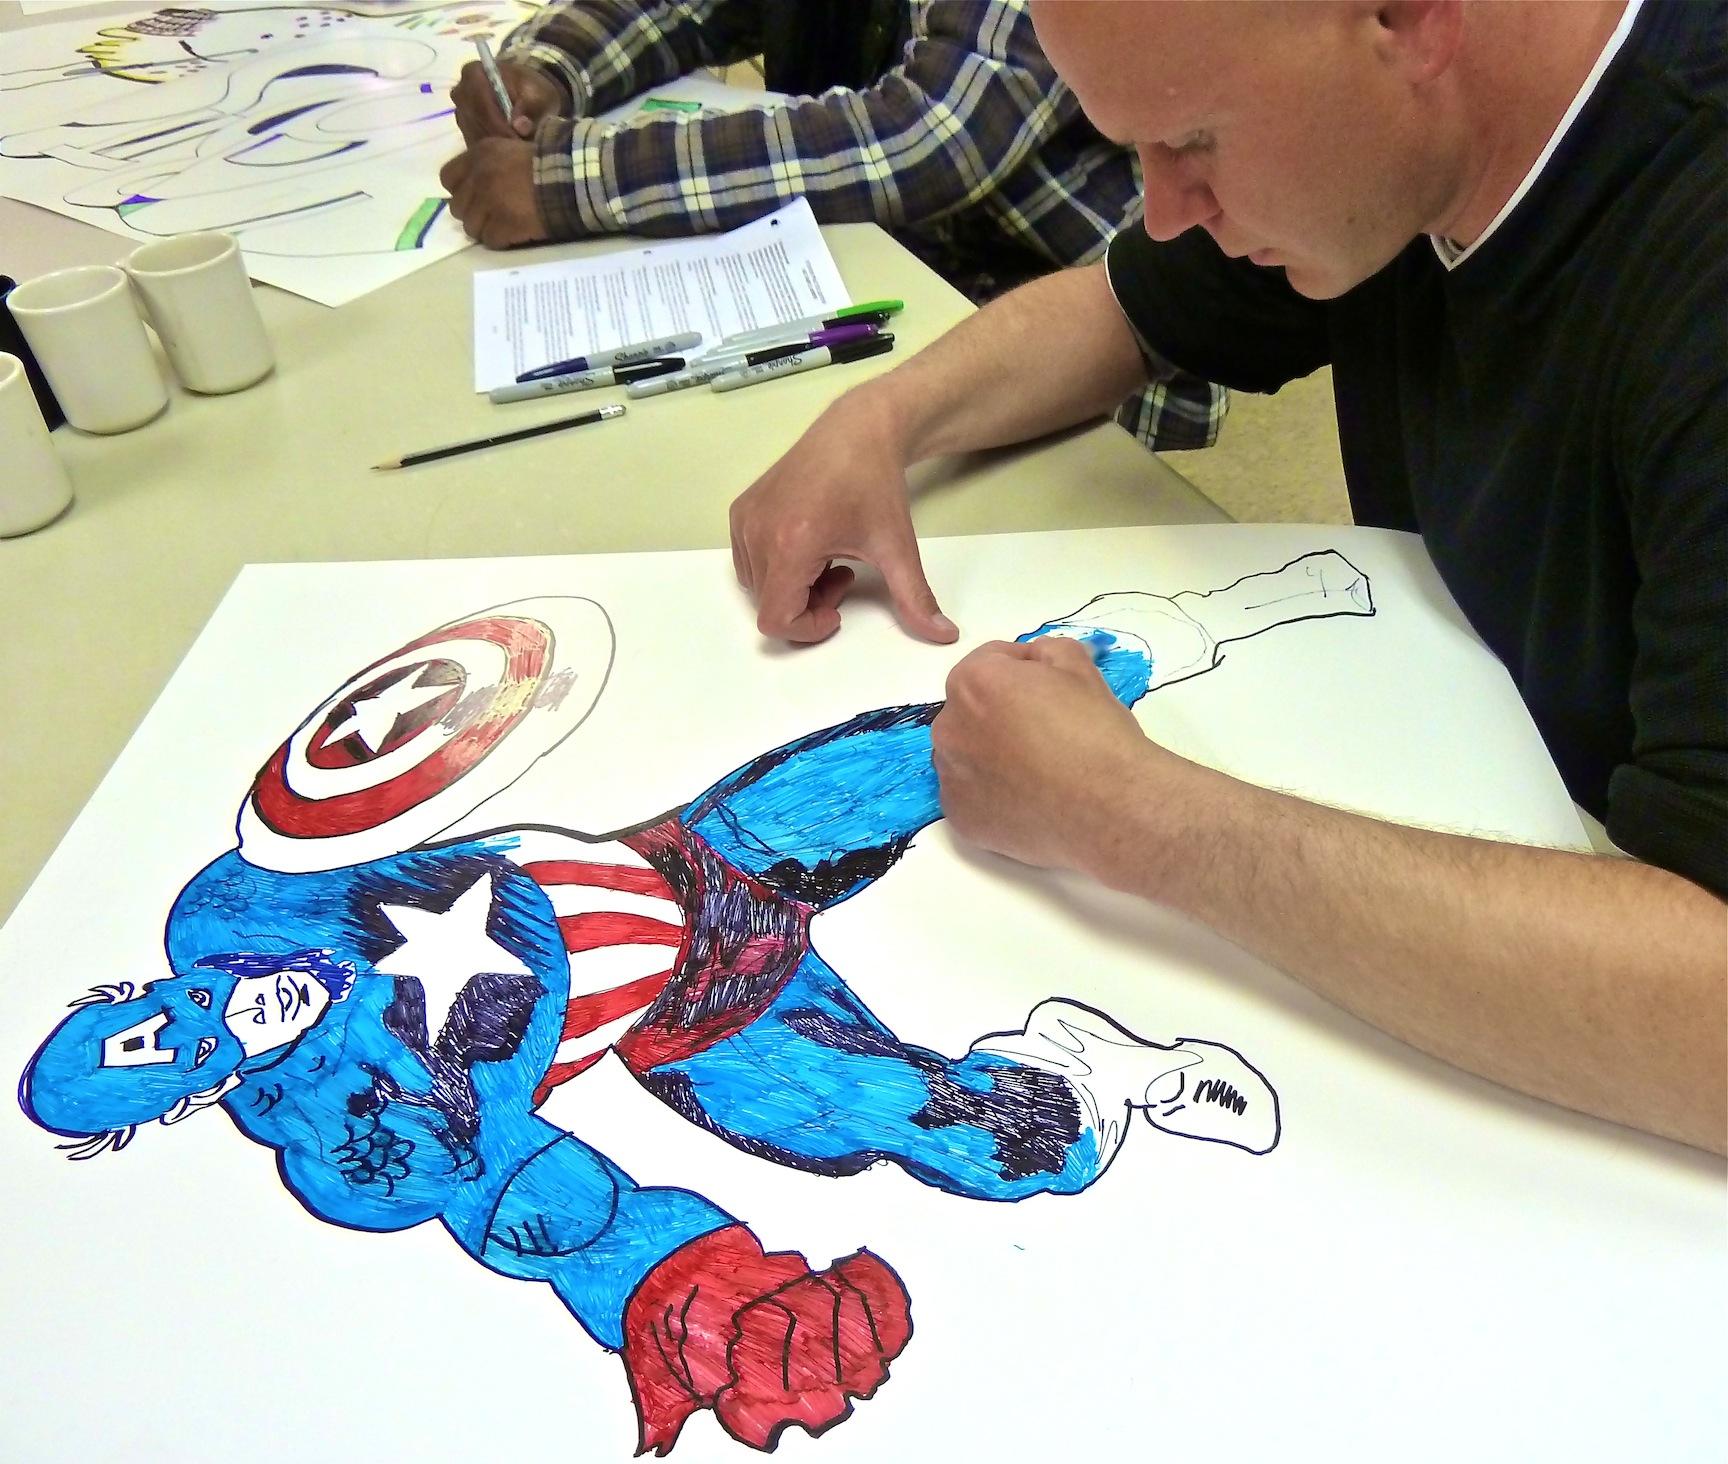 Drawn cartoon sharpie #13